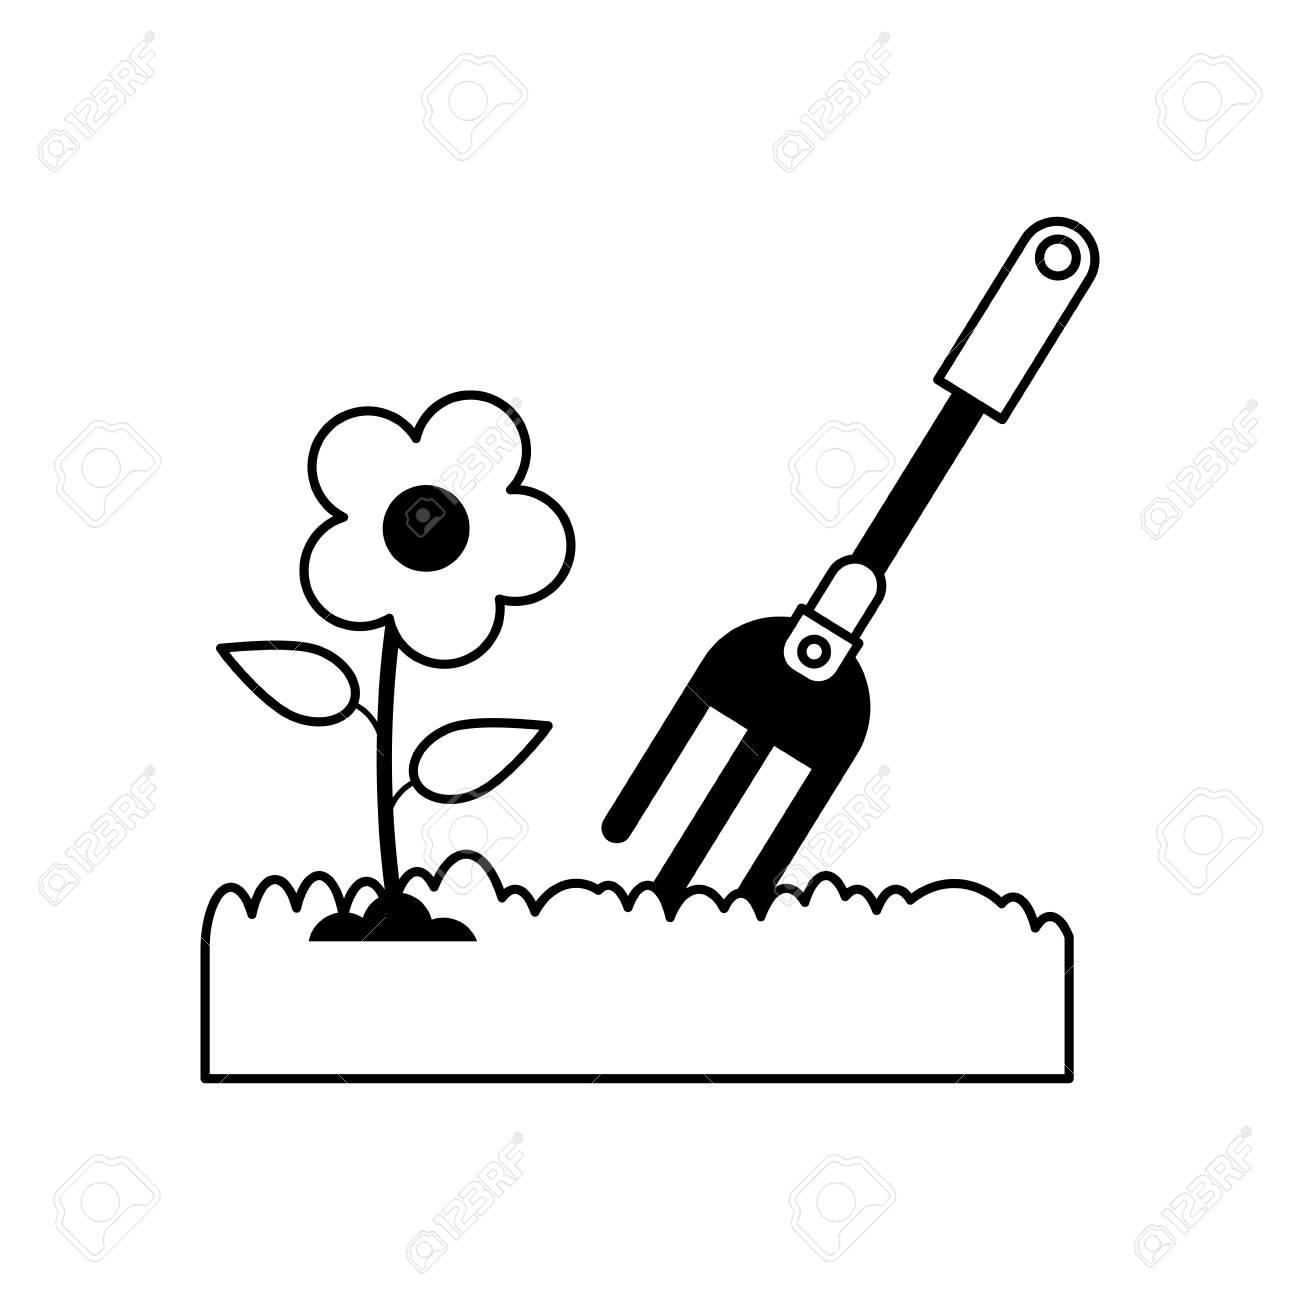 rake gardening tool icon image vector illustration design black...